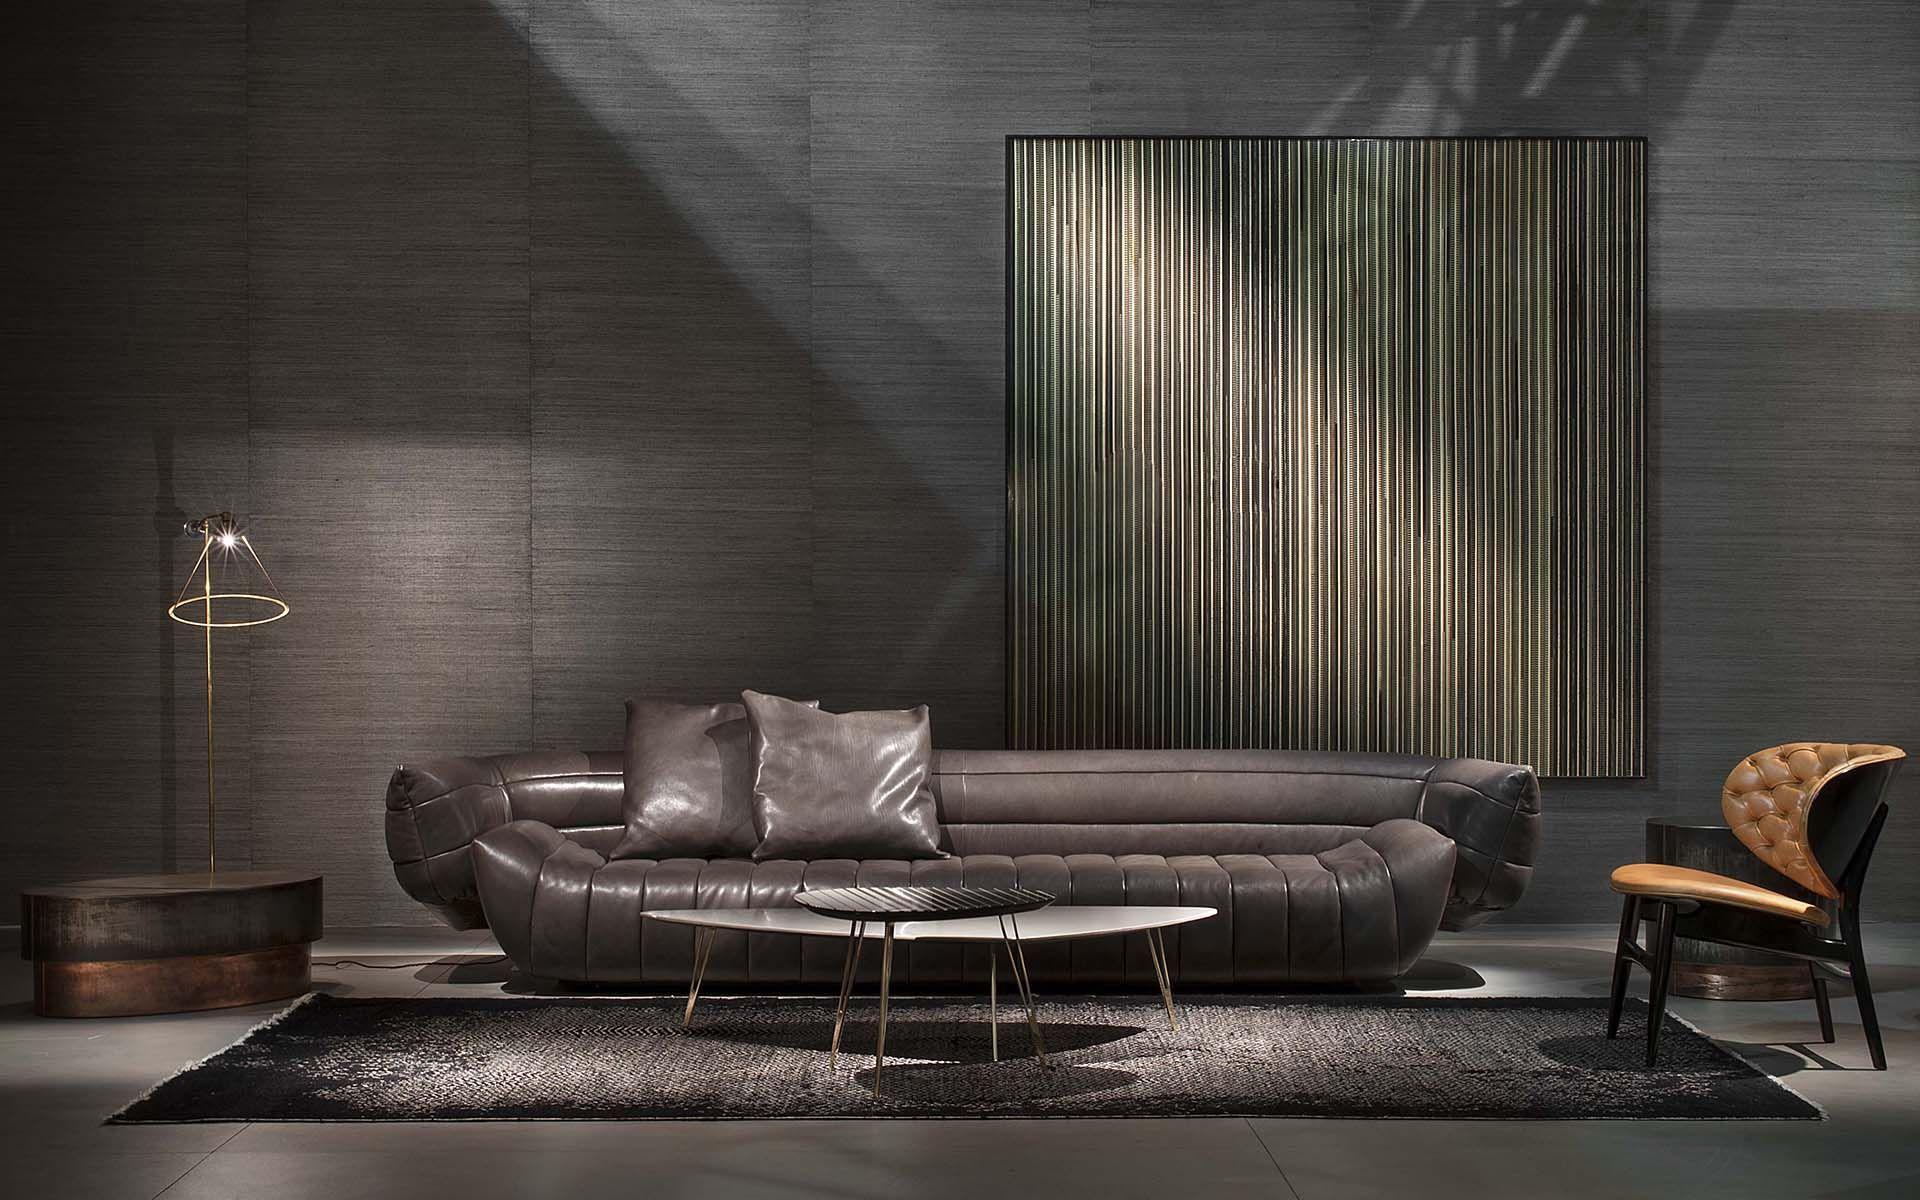 Baxter Tactile Luxury Bedroom Furniture Luxurious Bedrooms Store Design Interior